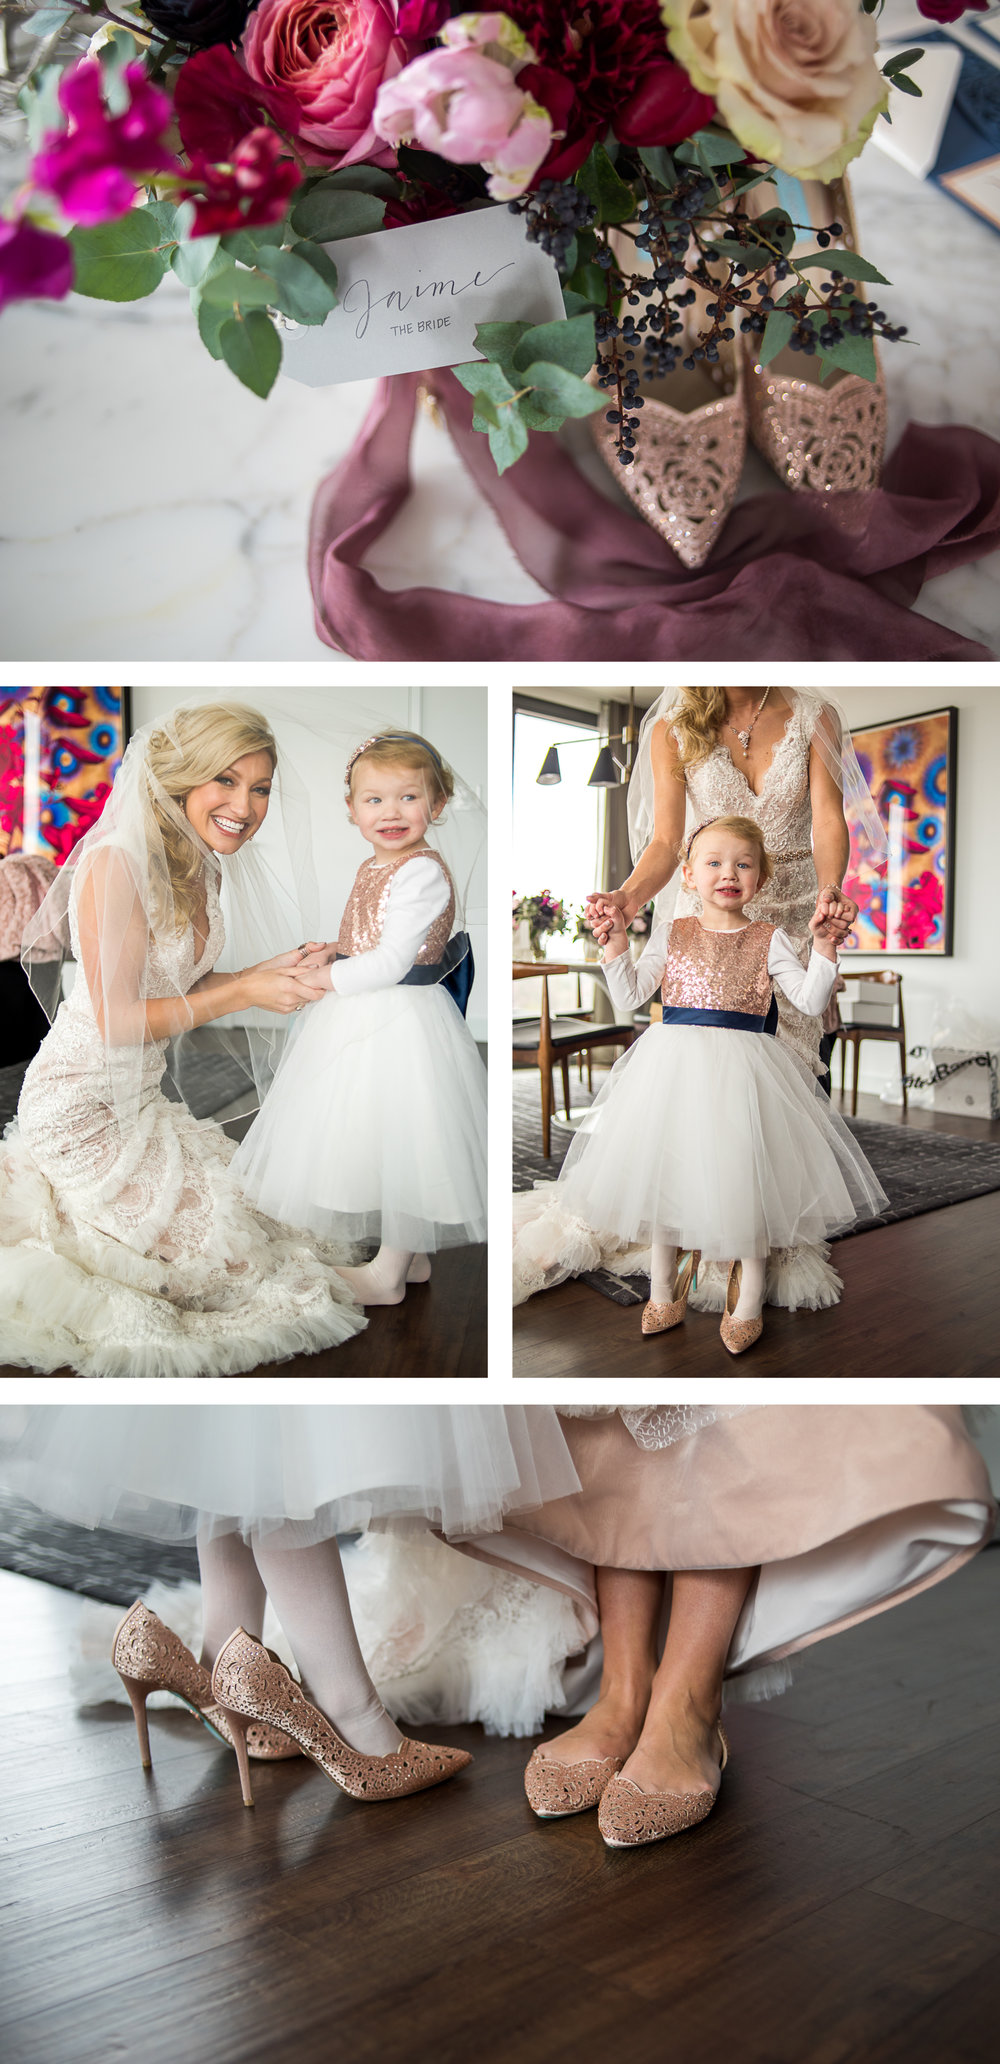 Brett Loves Elle, Columbus Wedding Photographers, Columbus Wedding Photography, Ohio Wedding, Flower Girl in Brides Shoes, Vintage Glam Wedding